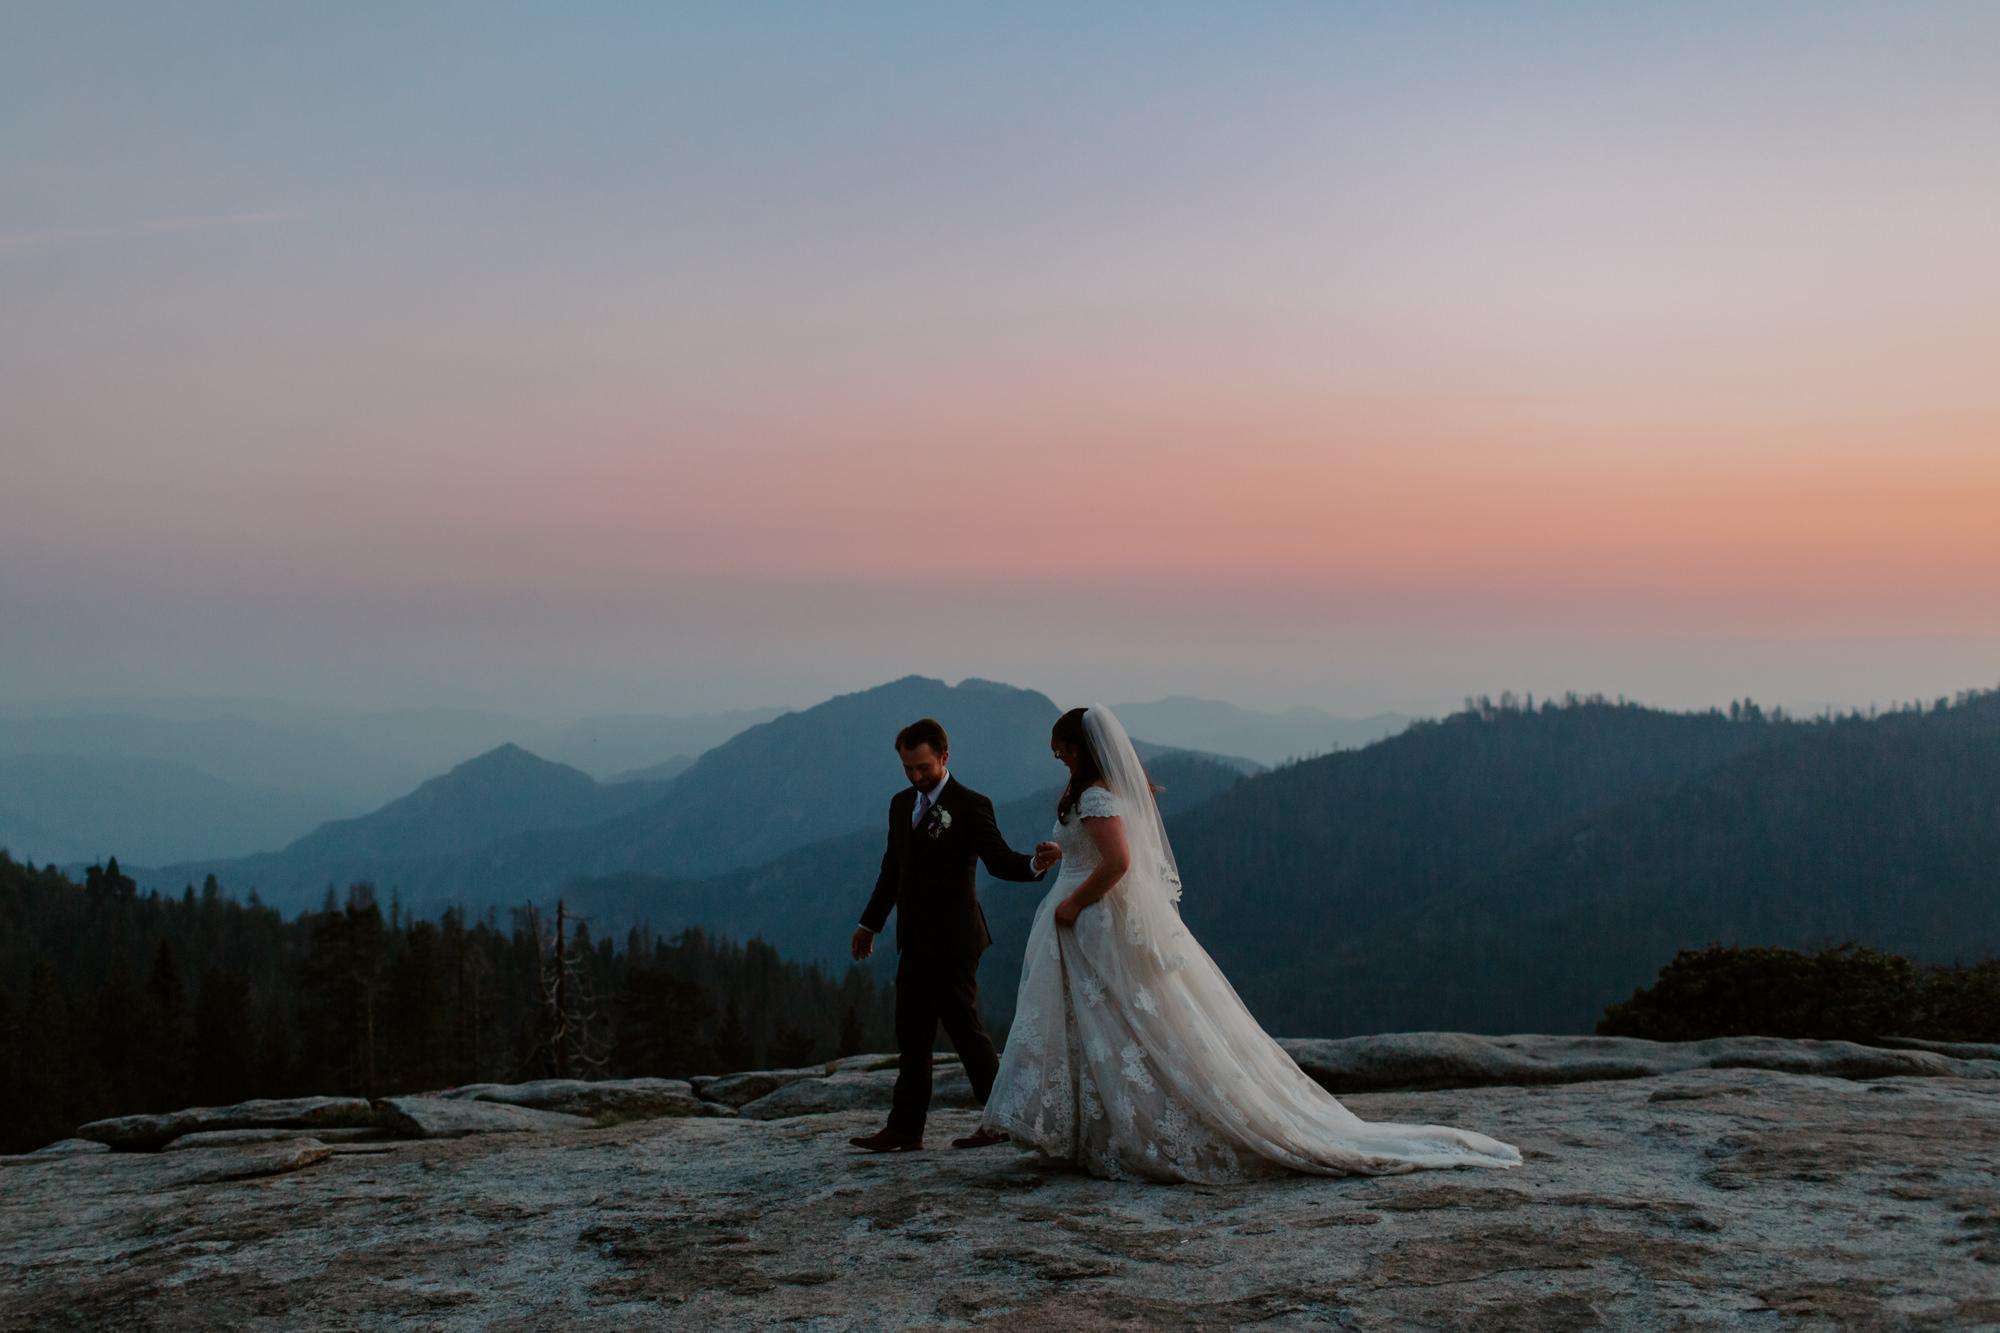 sequoia national park wedding.jpg